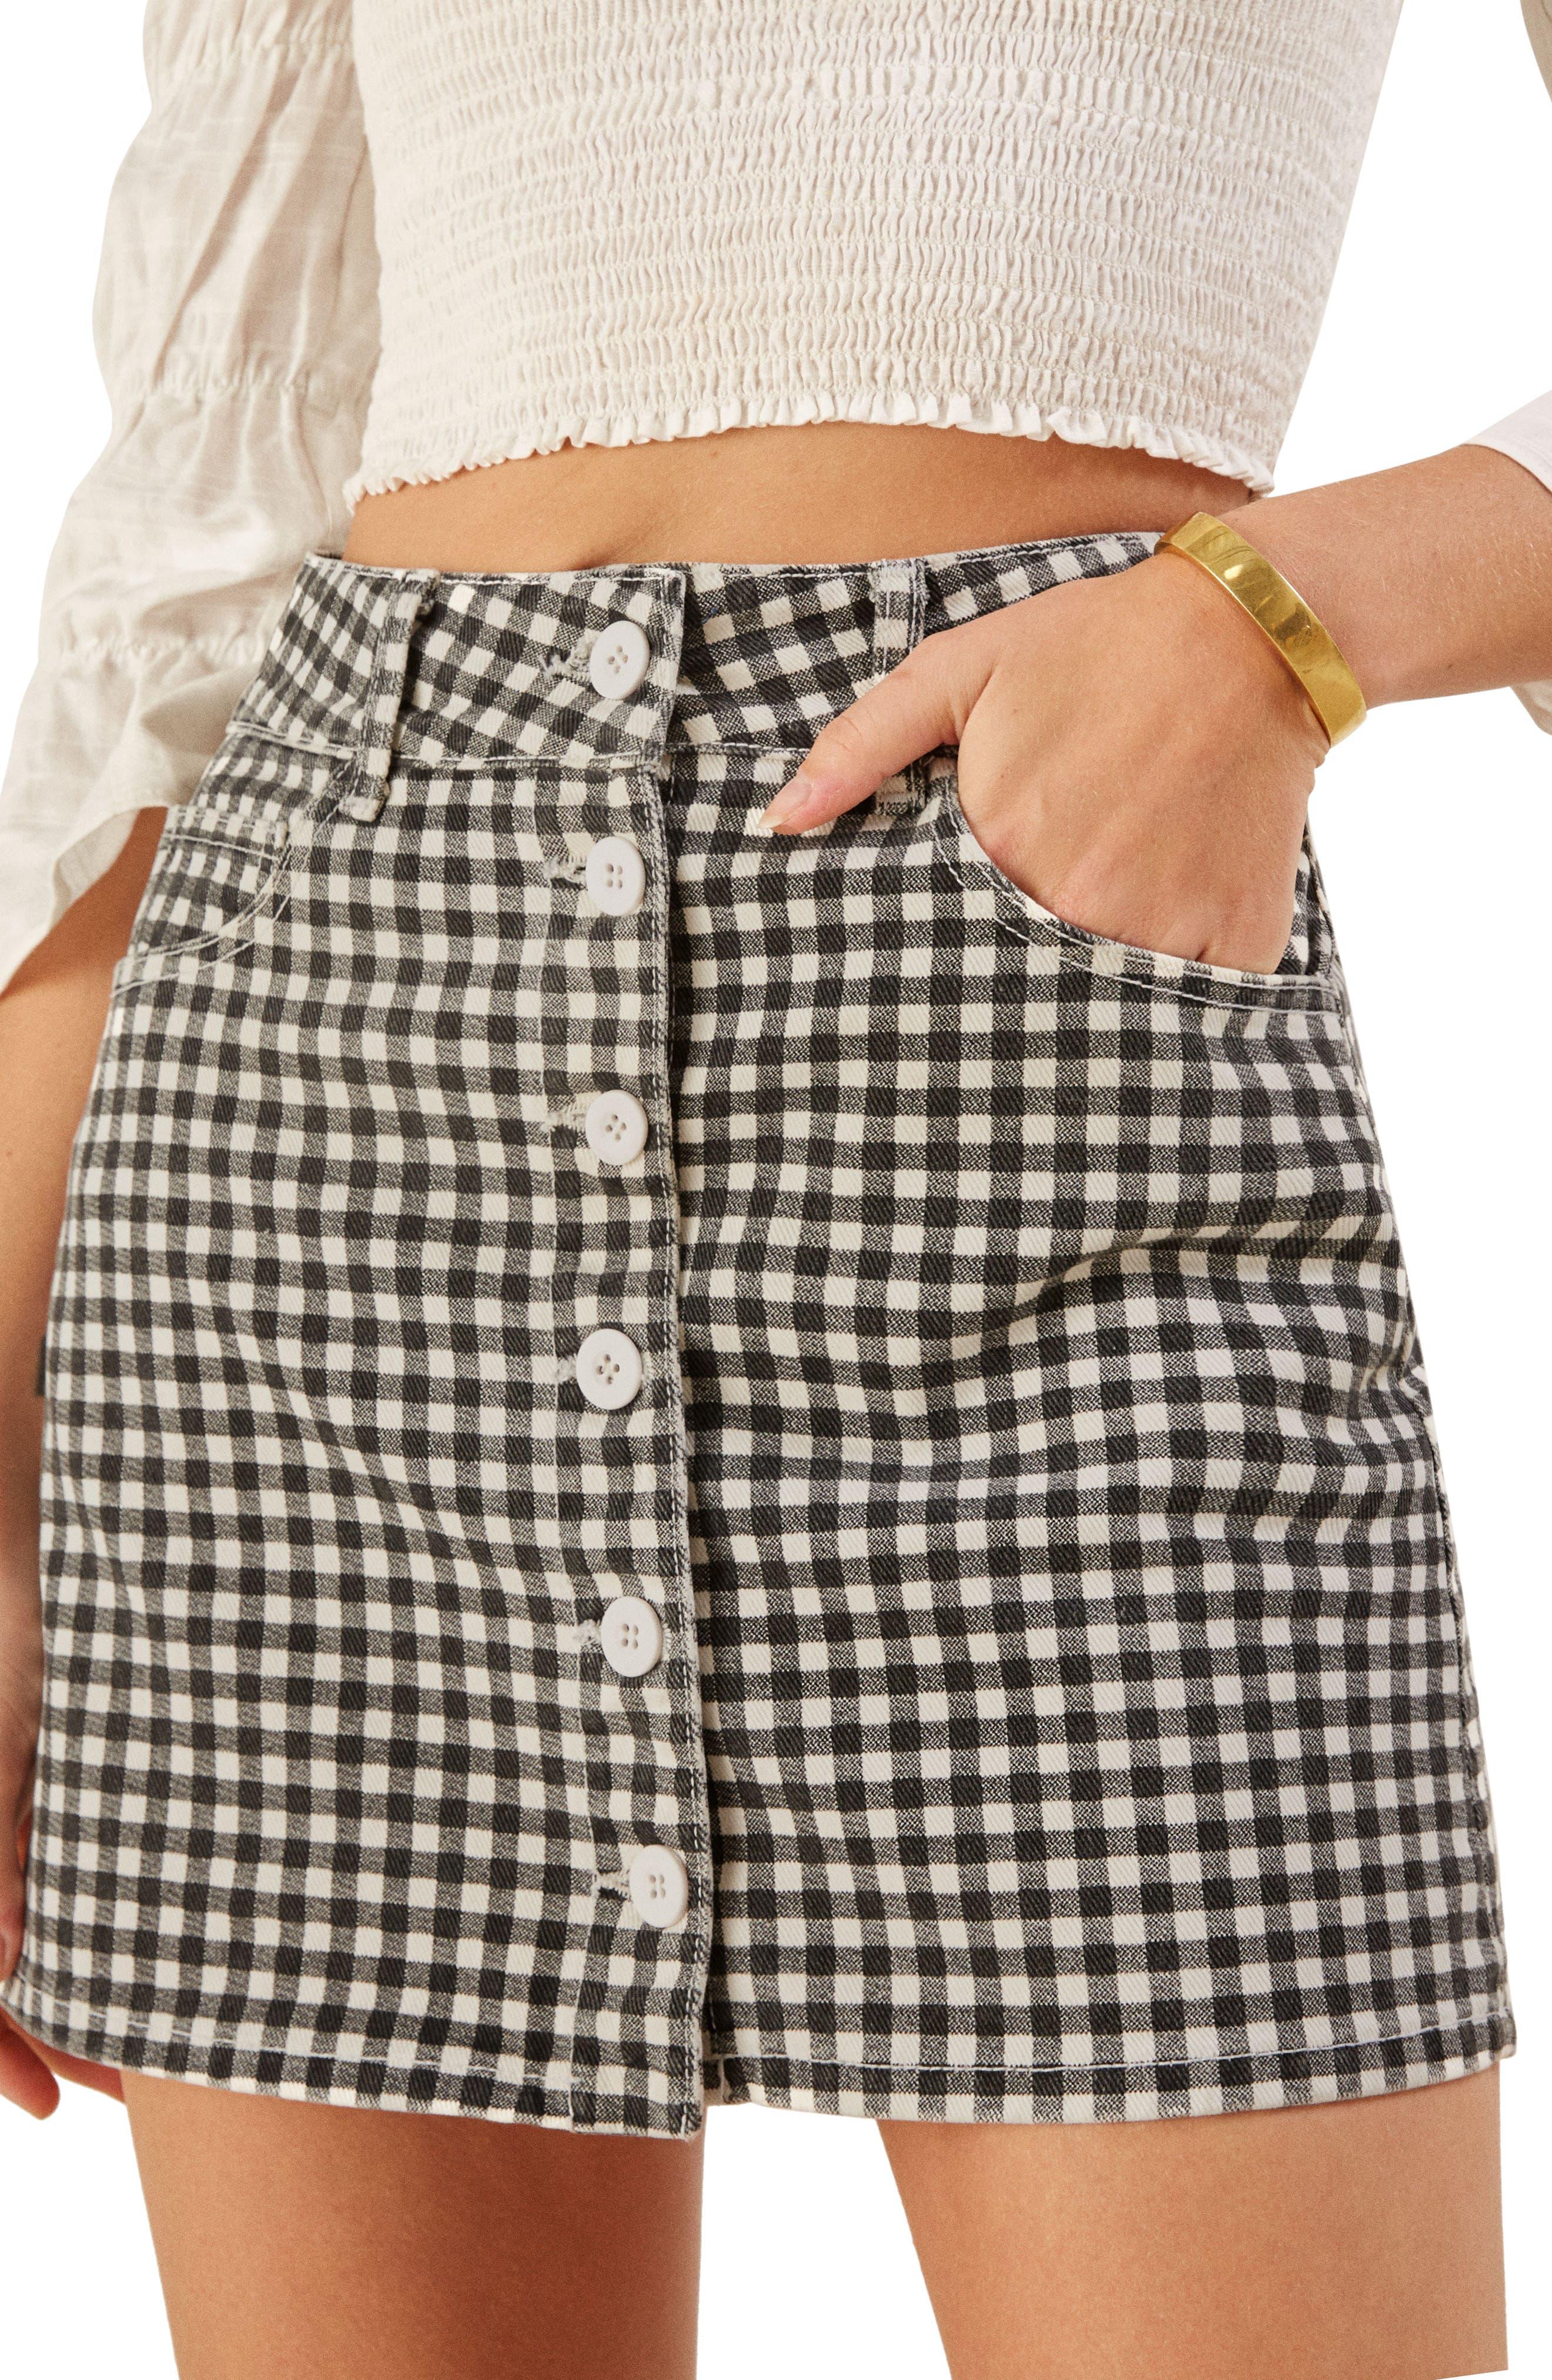 REFORMATION Bianca Denim Miniskirt, Main, color, 001